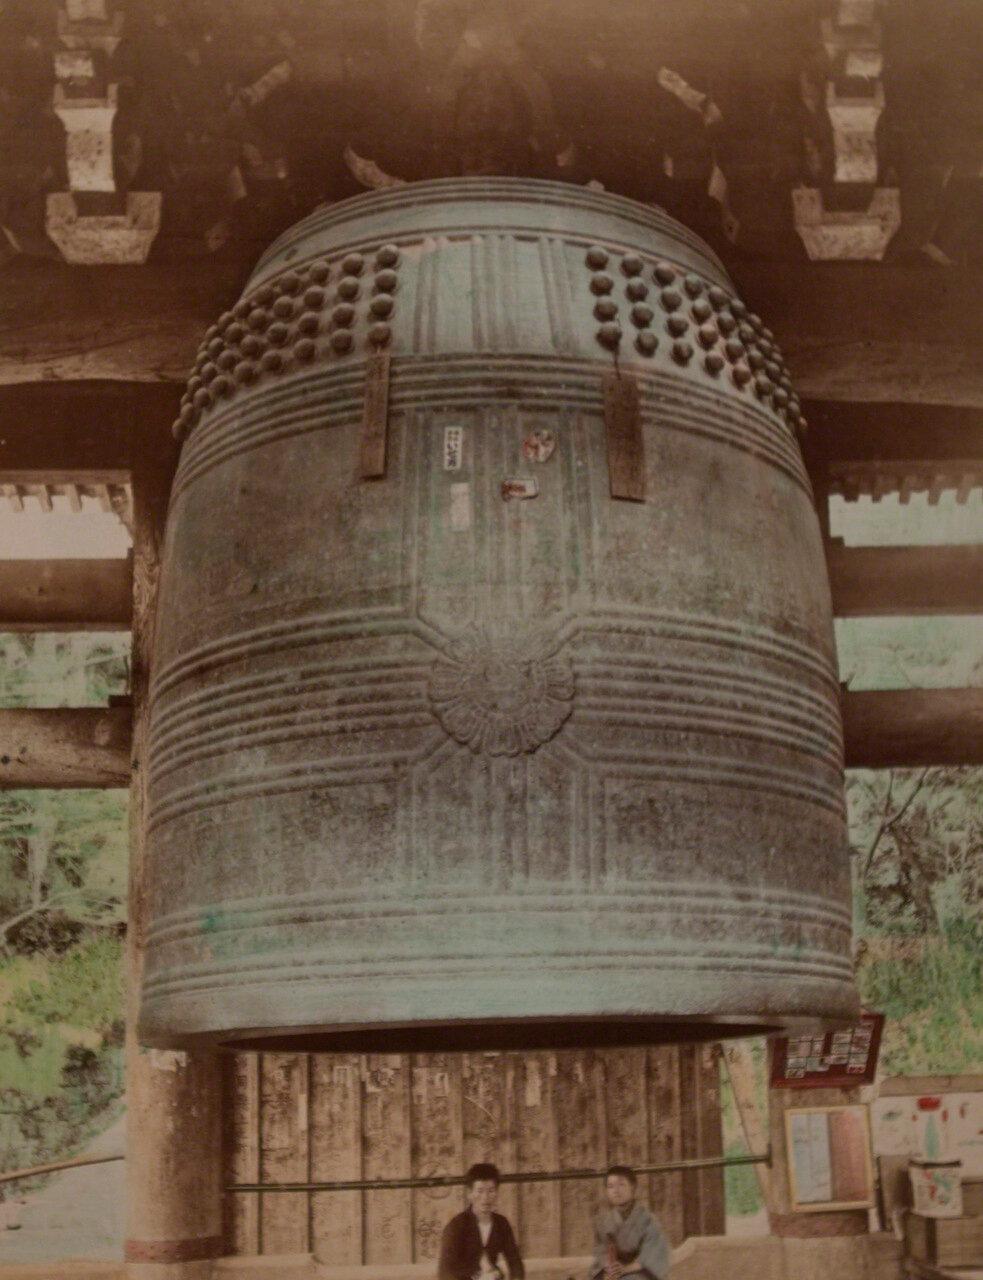 Киото. Большой колокол храма